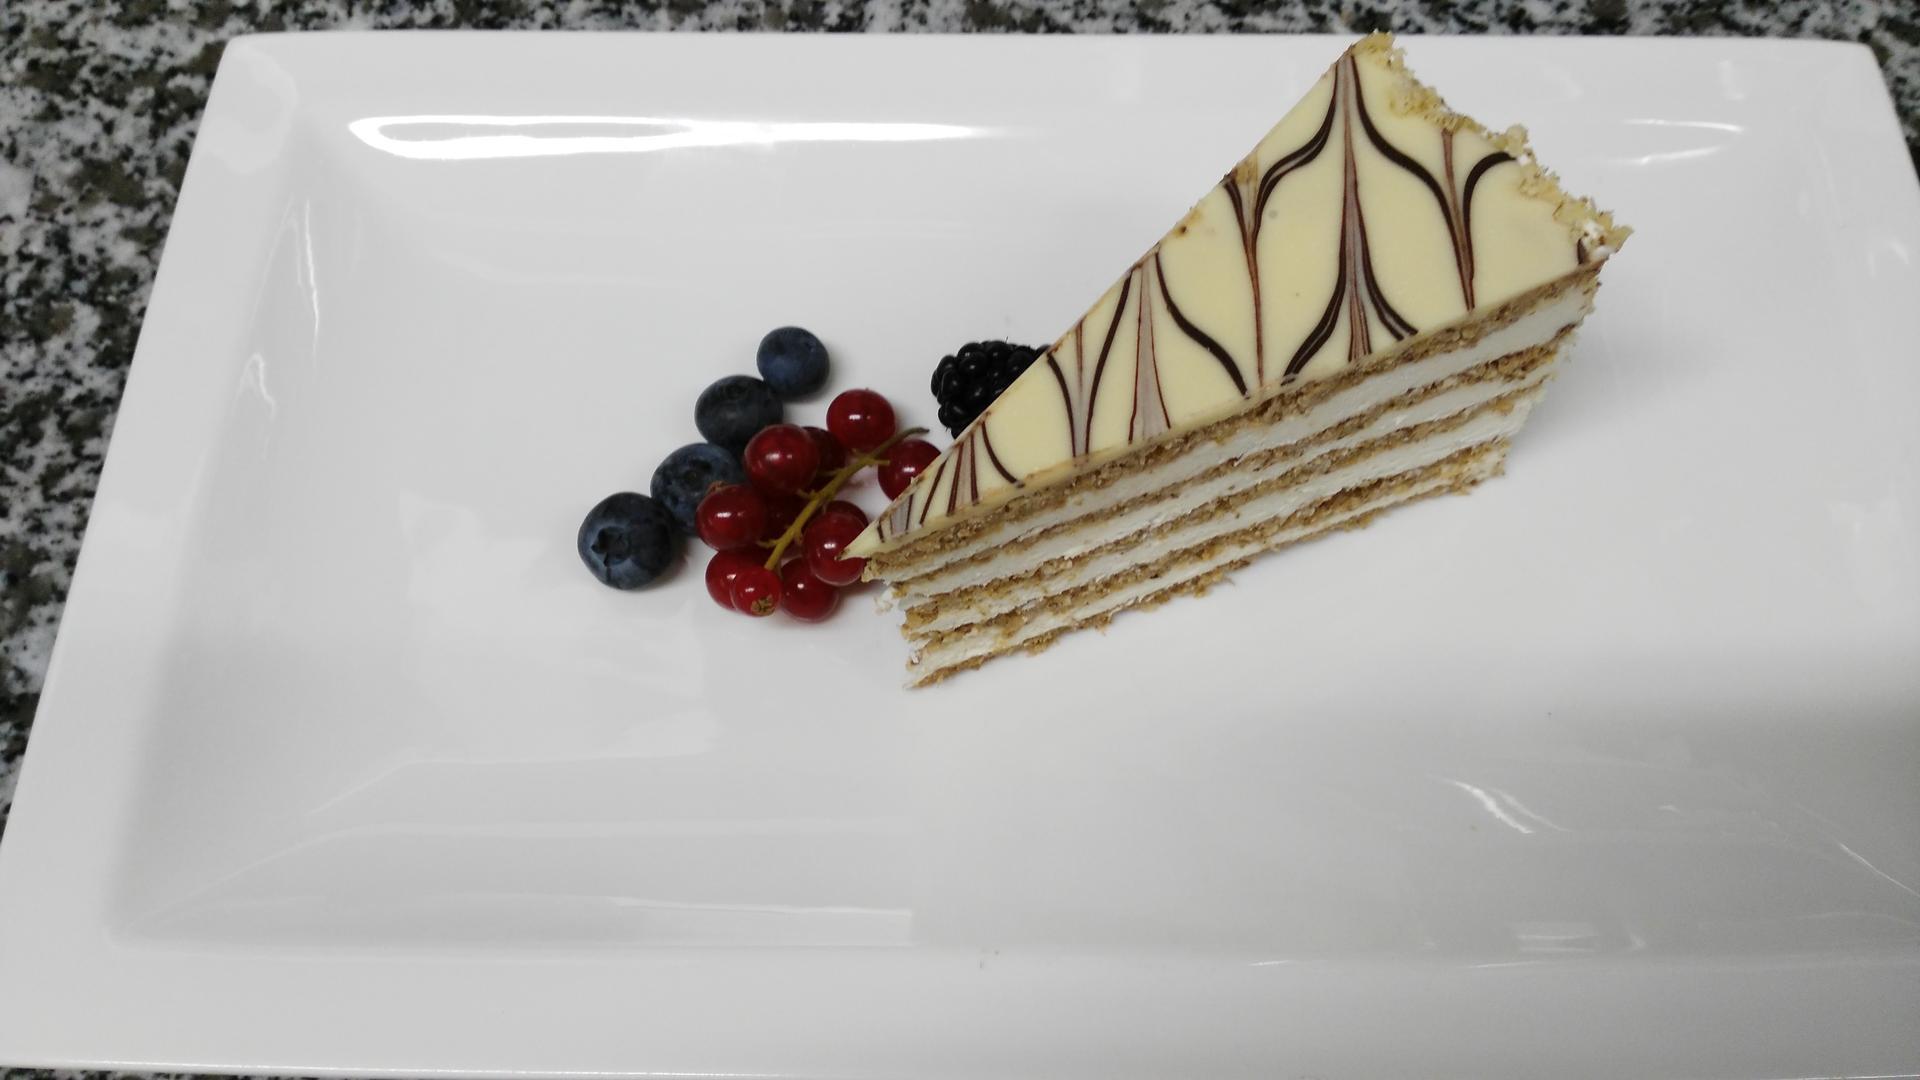 eszterhazy cake. באדיבות הקונדיטור יוז'ף יוהוש